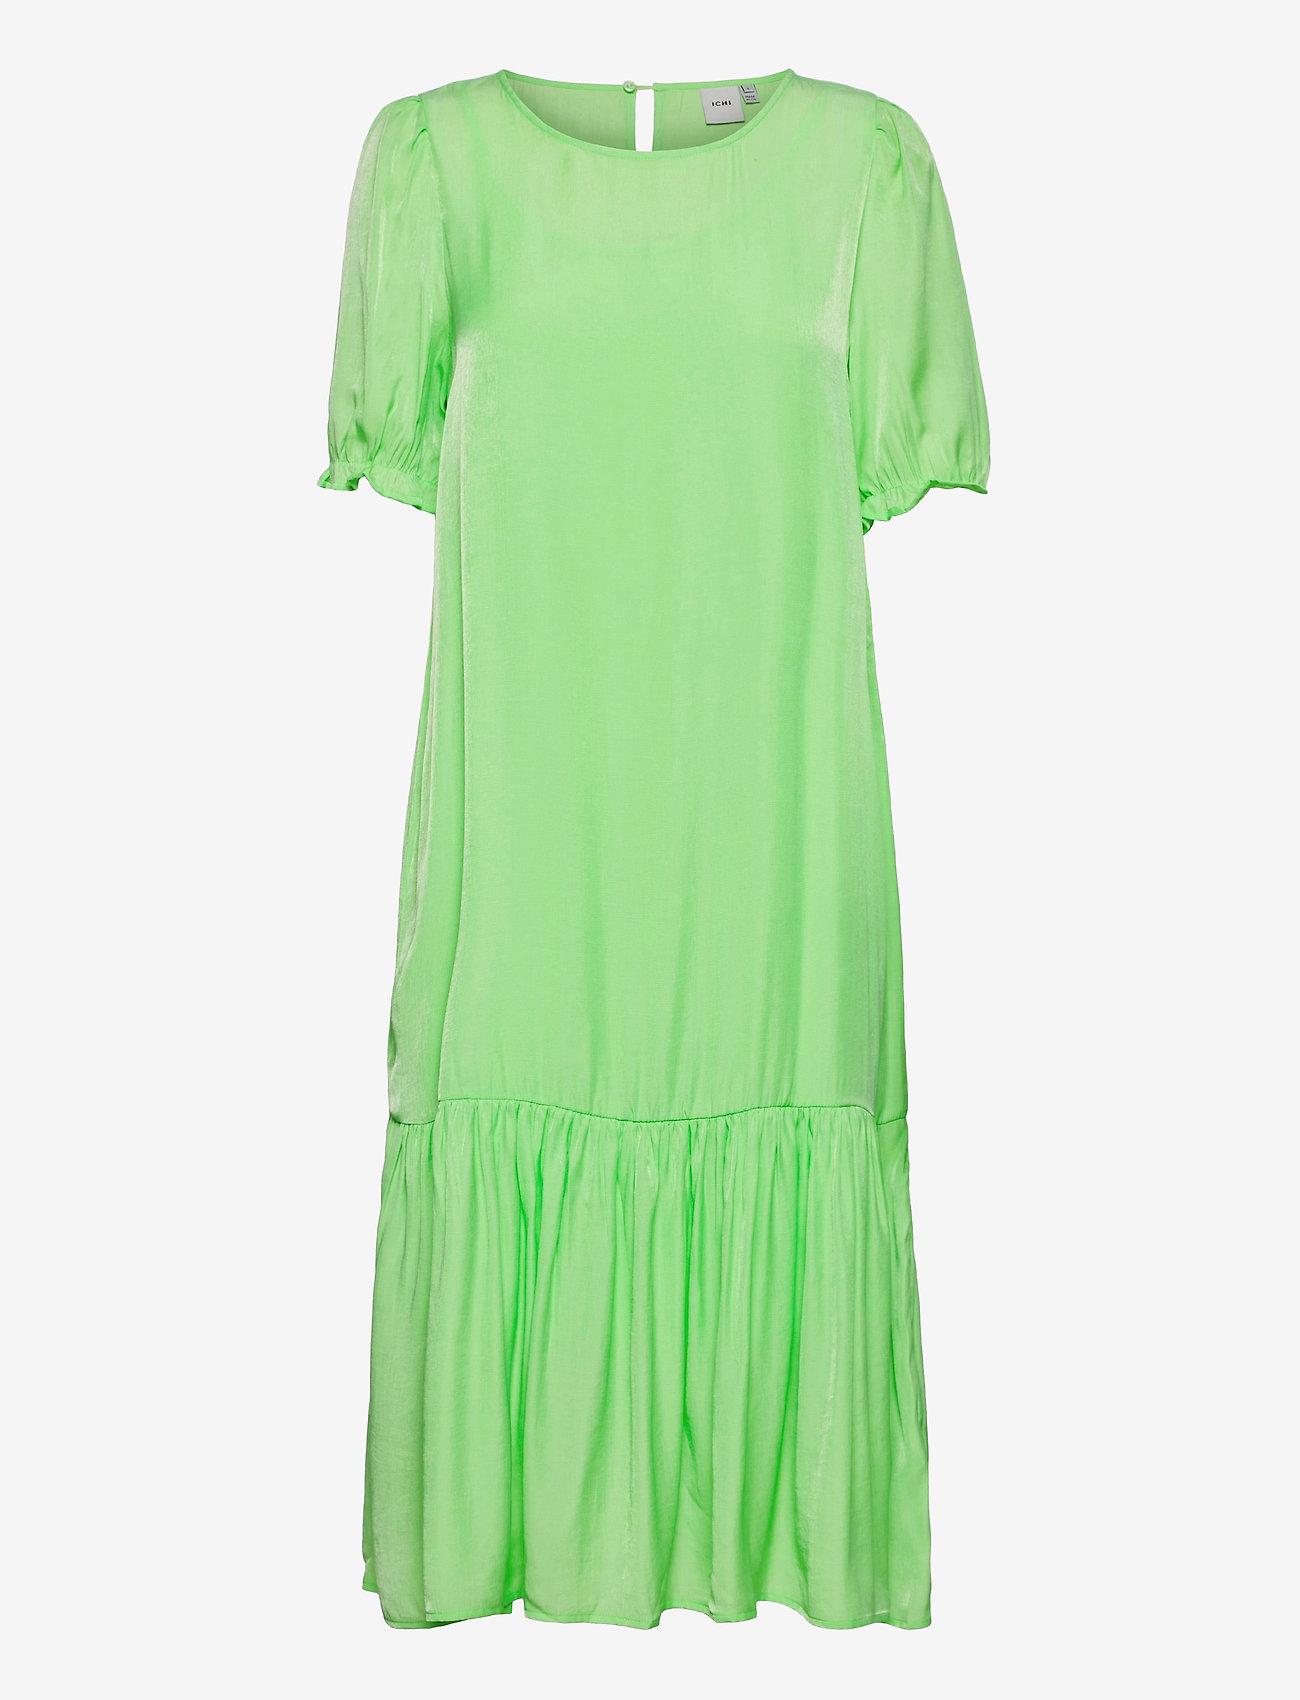 ICHI - IHEDINA DR - summer dresses - paradise green - 0